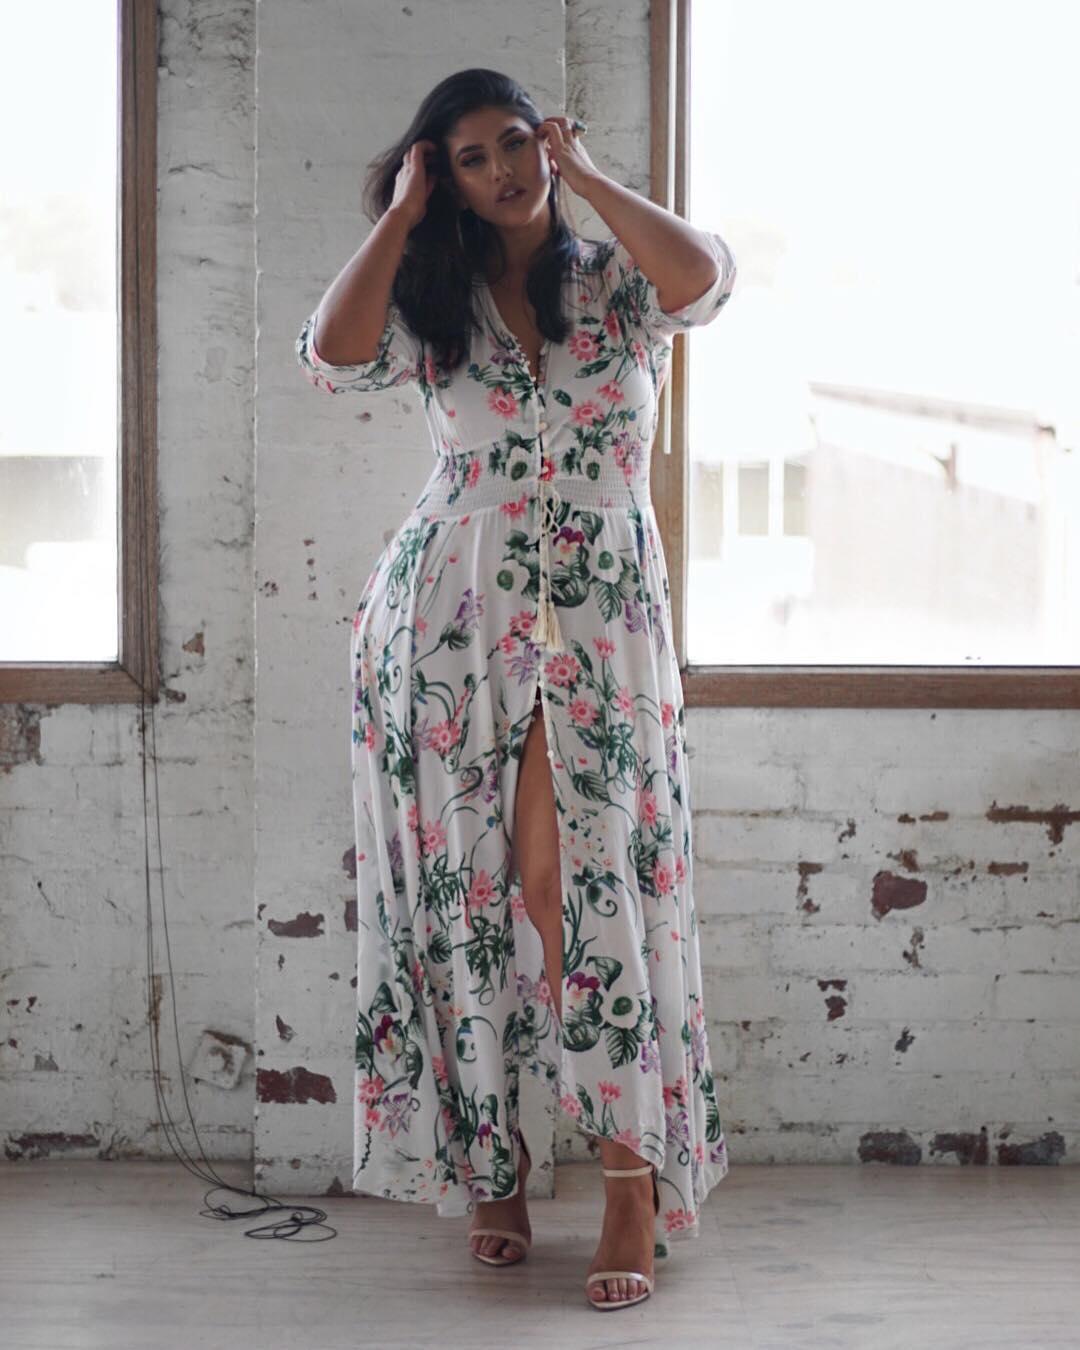 estampa floral fundo branco em vestido plus size longo